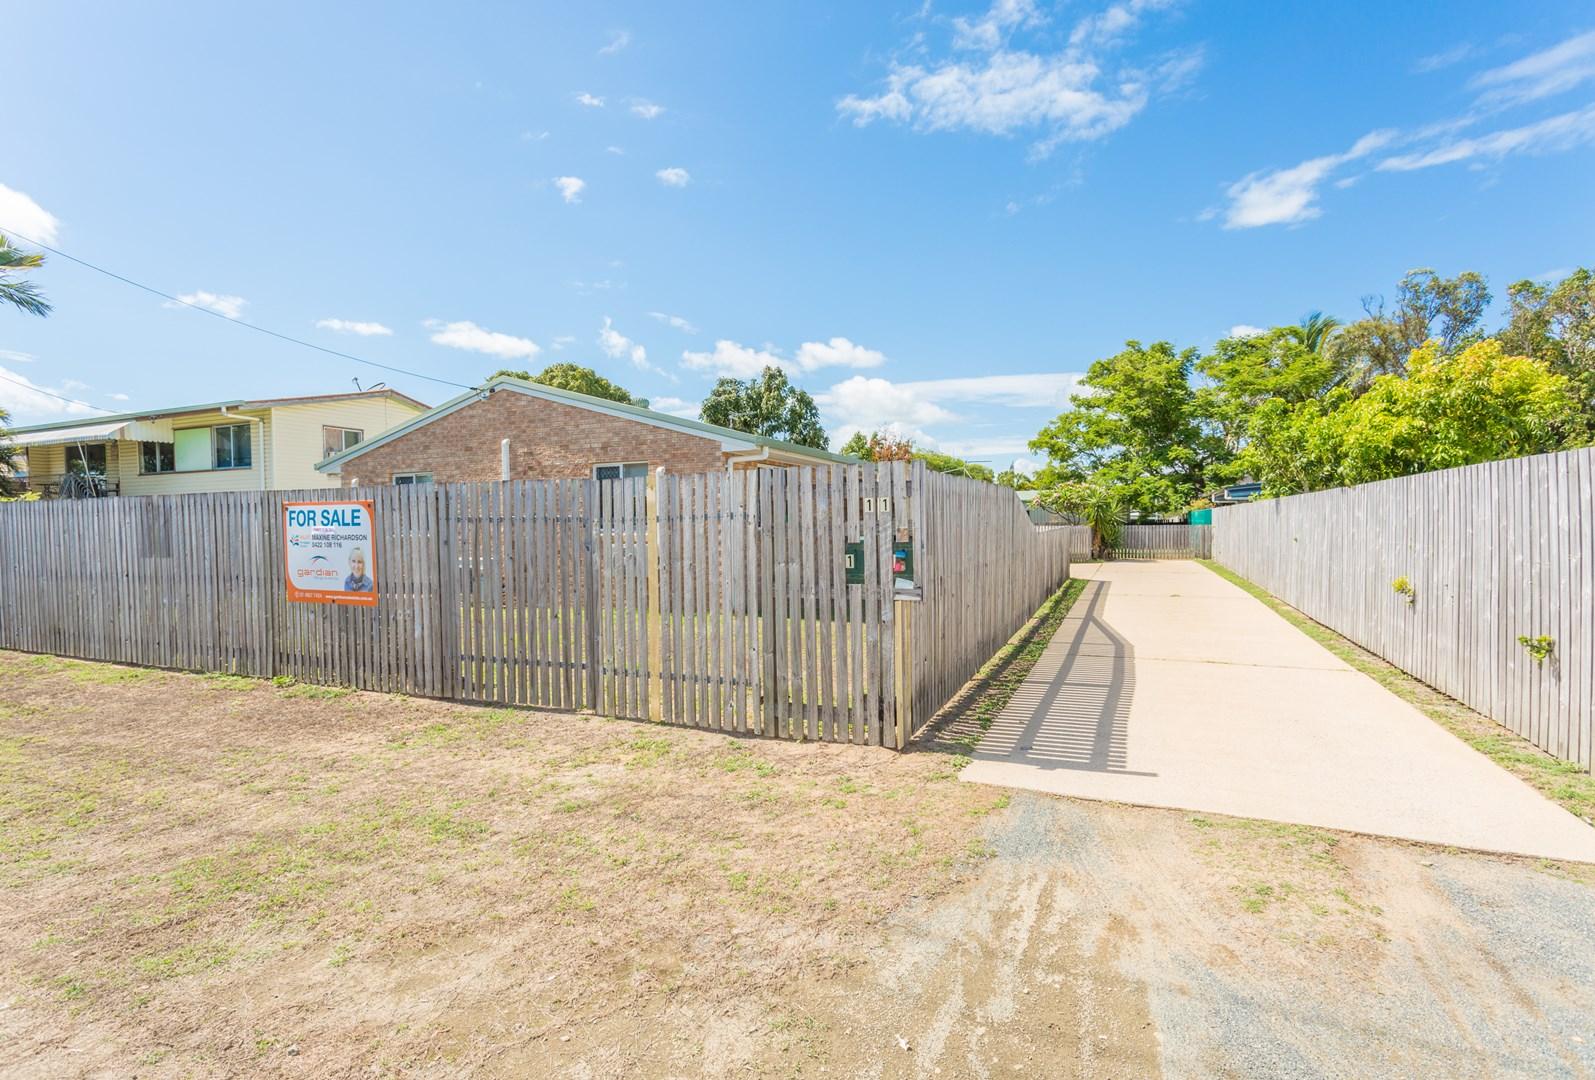 1 & 2/11 Finch Street, Slade Point QLD 4740, Image 0